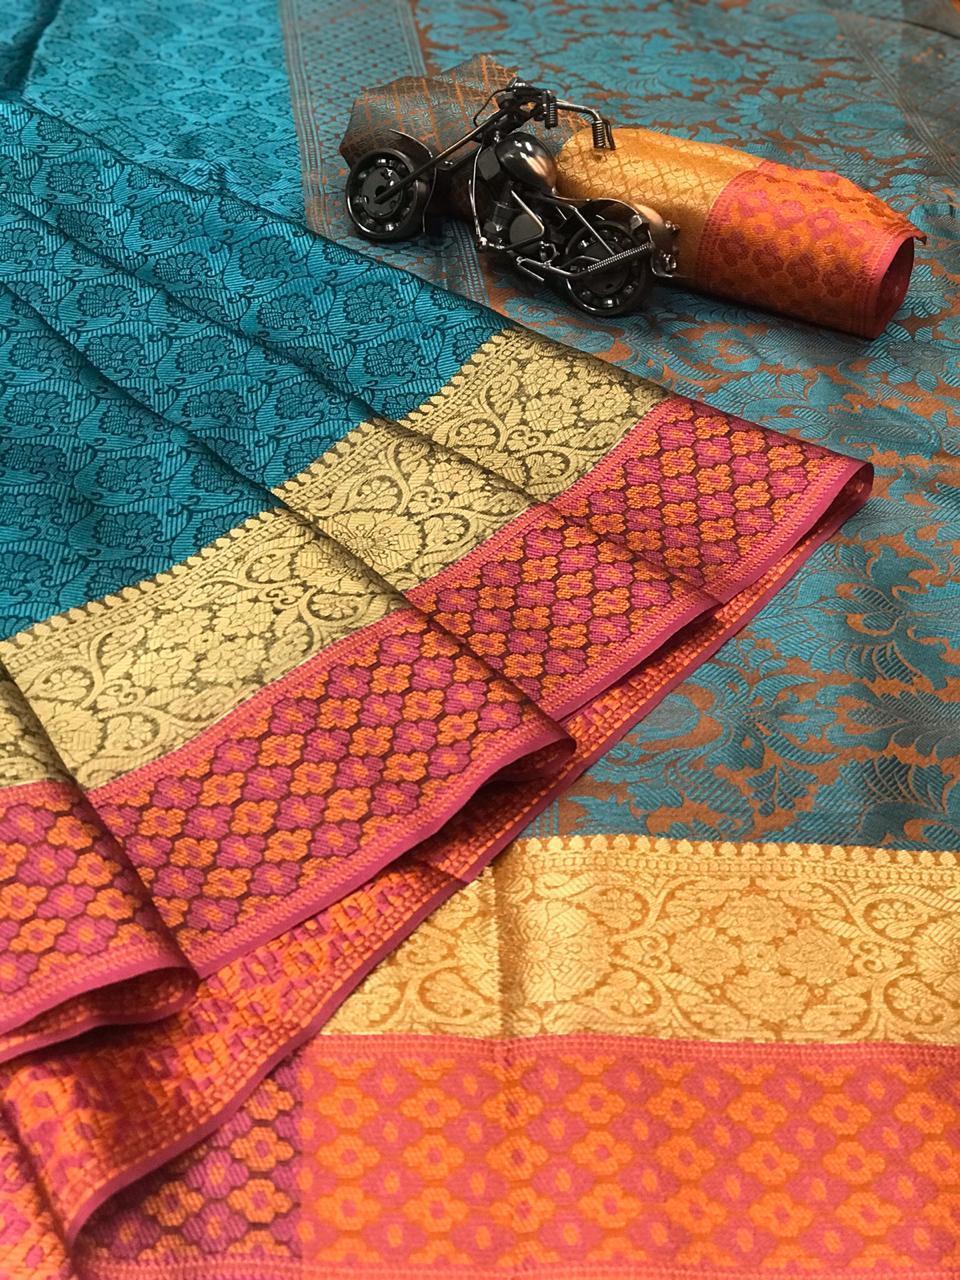 ZOYA weaving Kora muslin silk saree